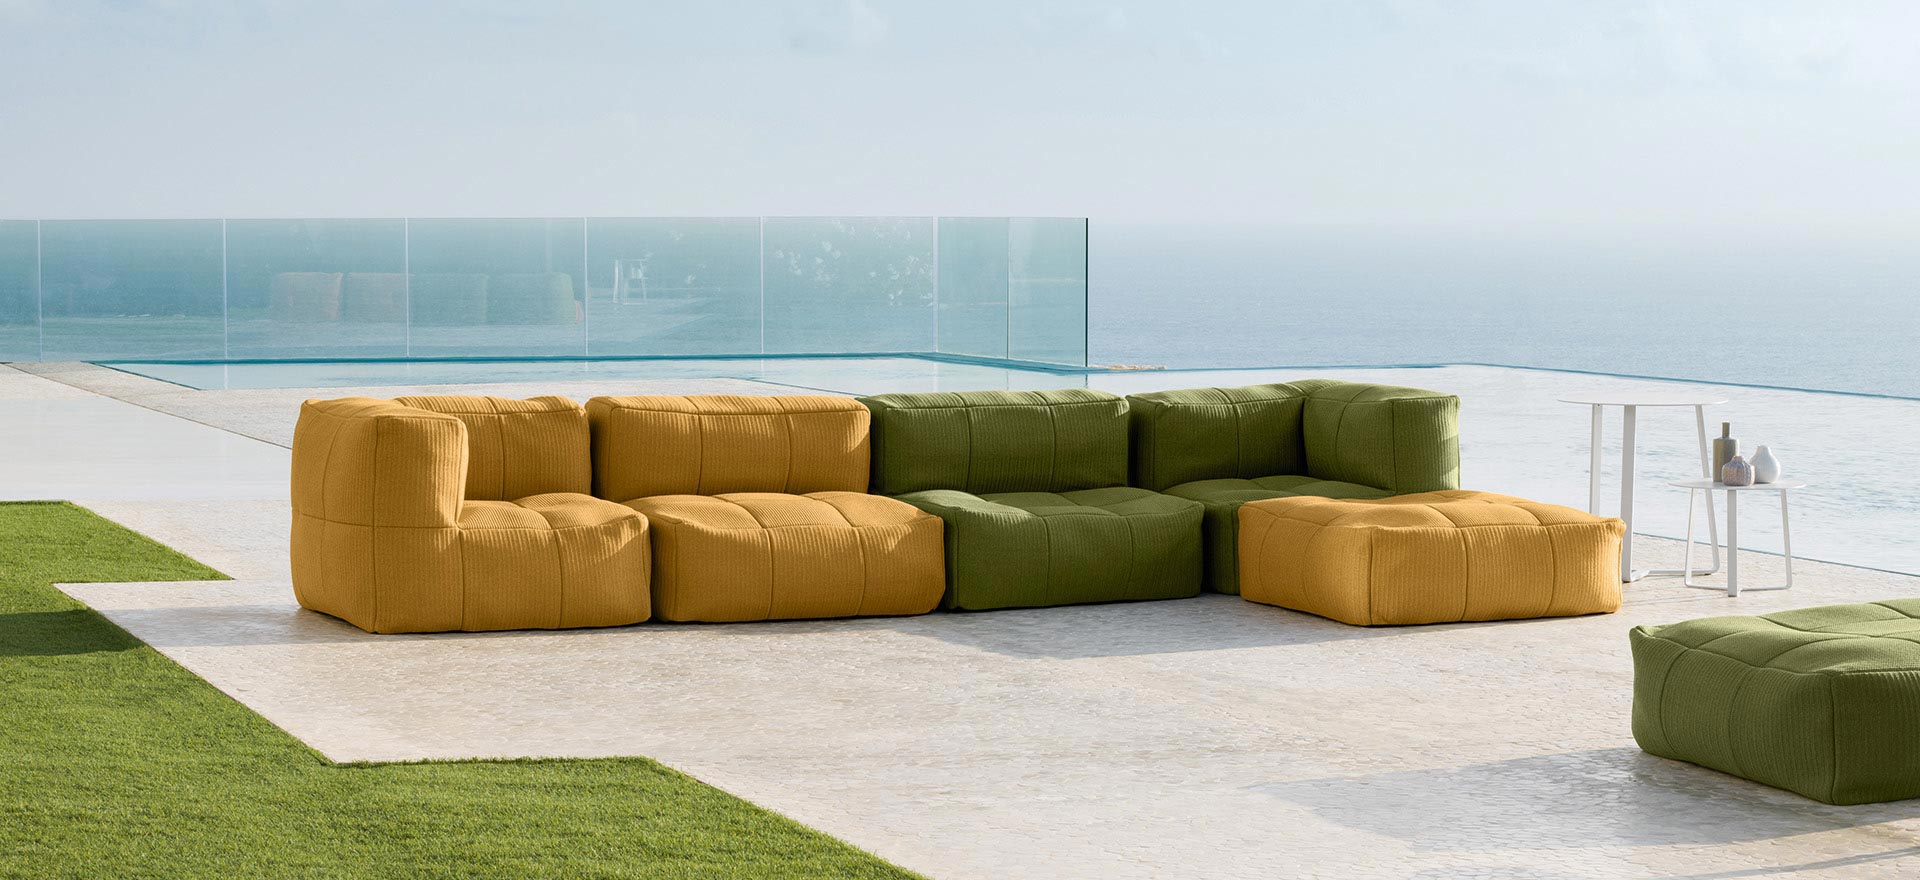 Outdoor sofas - armchairs - ottomans - stools